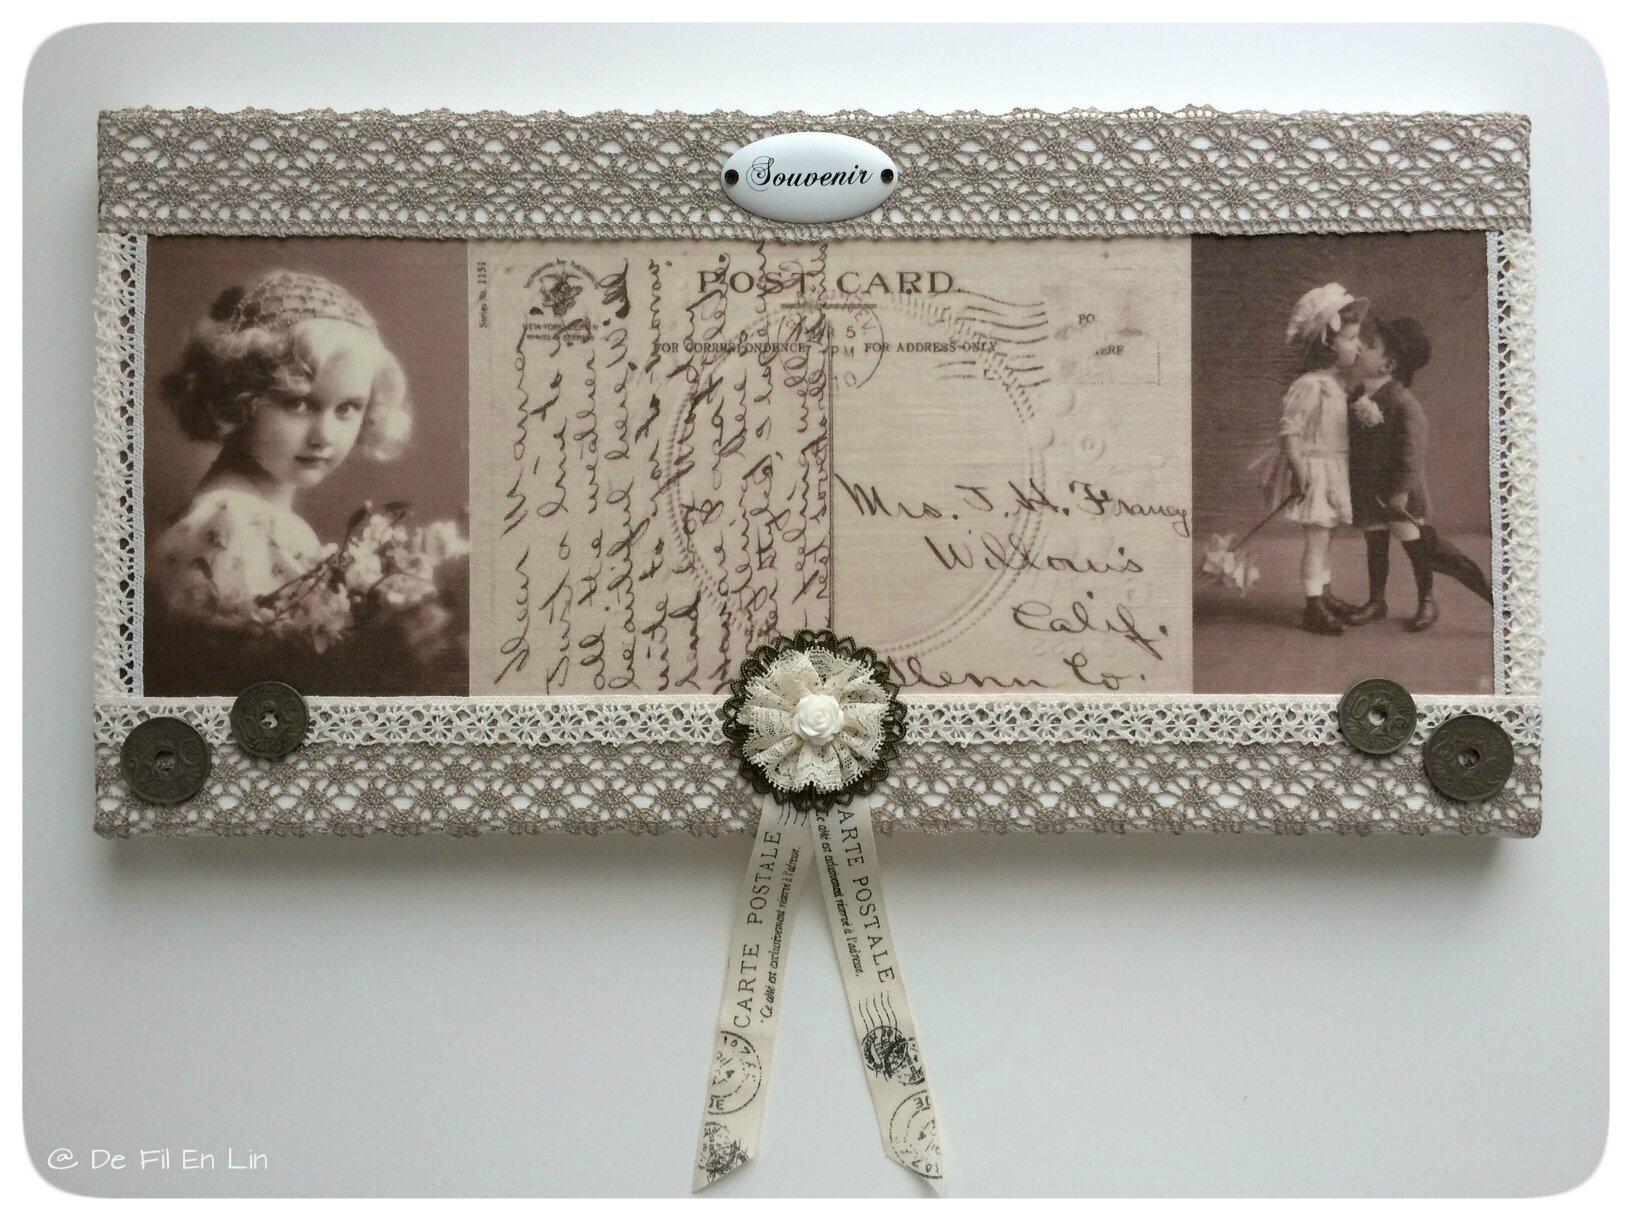 Cadre retro romantique carte postale